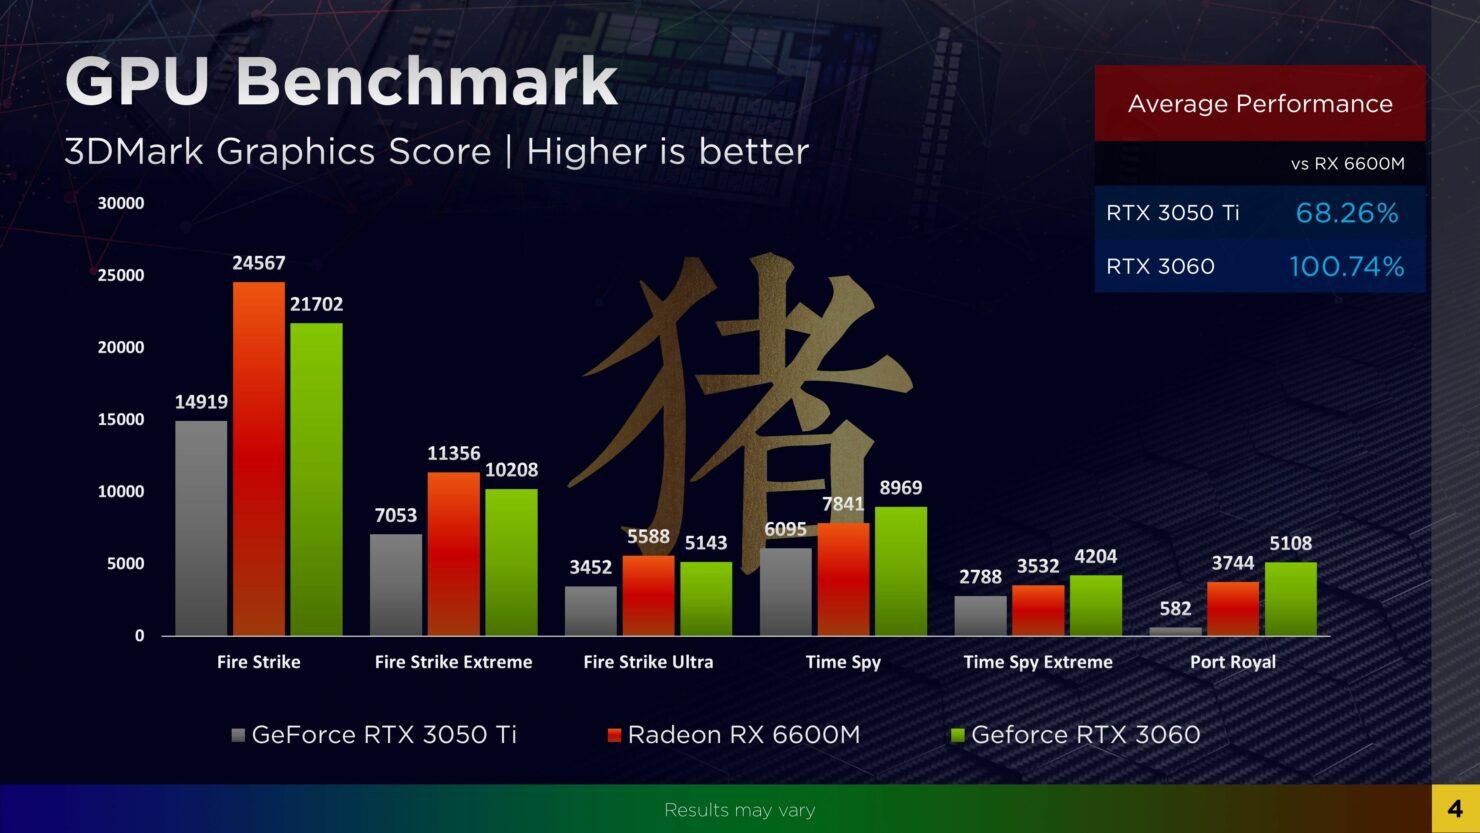 amd-radeon-rx-6600m-navi-23-rdna-2-gpu-synthetic-benchmarks